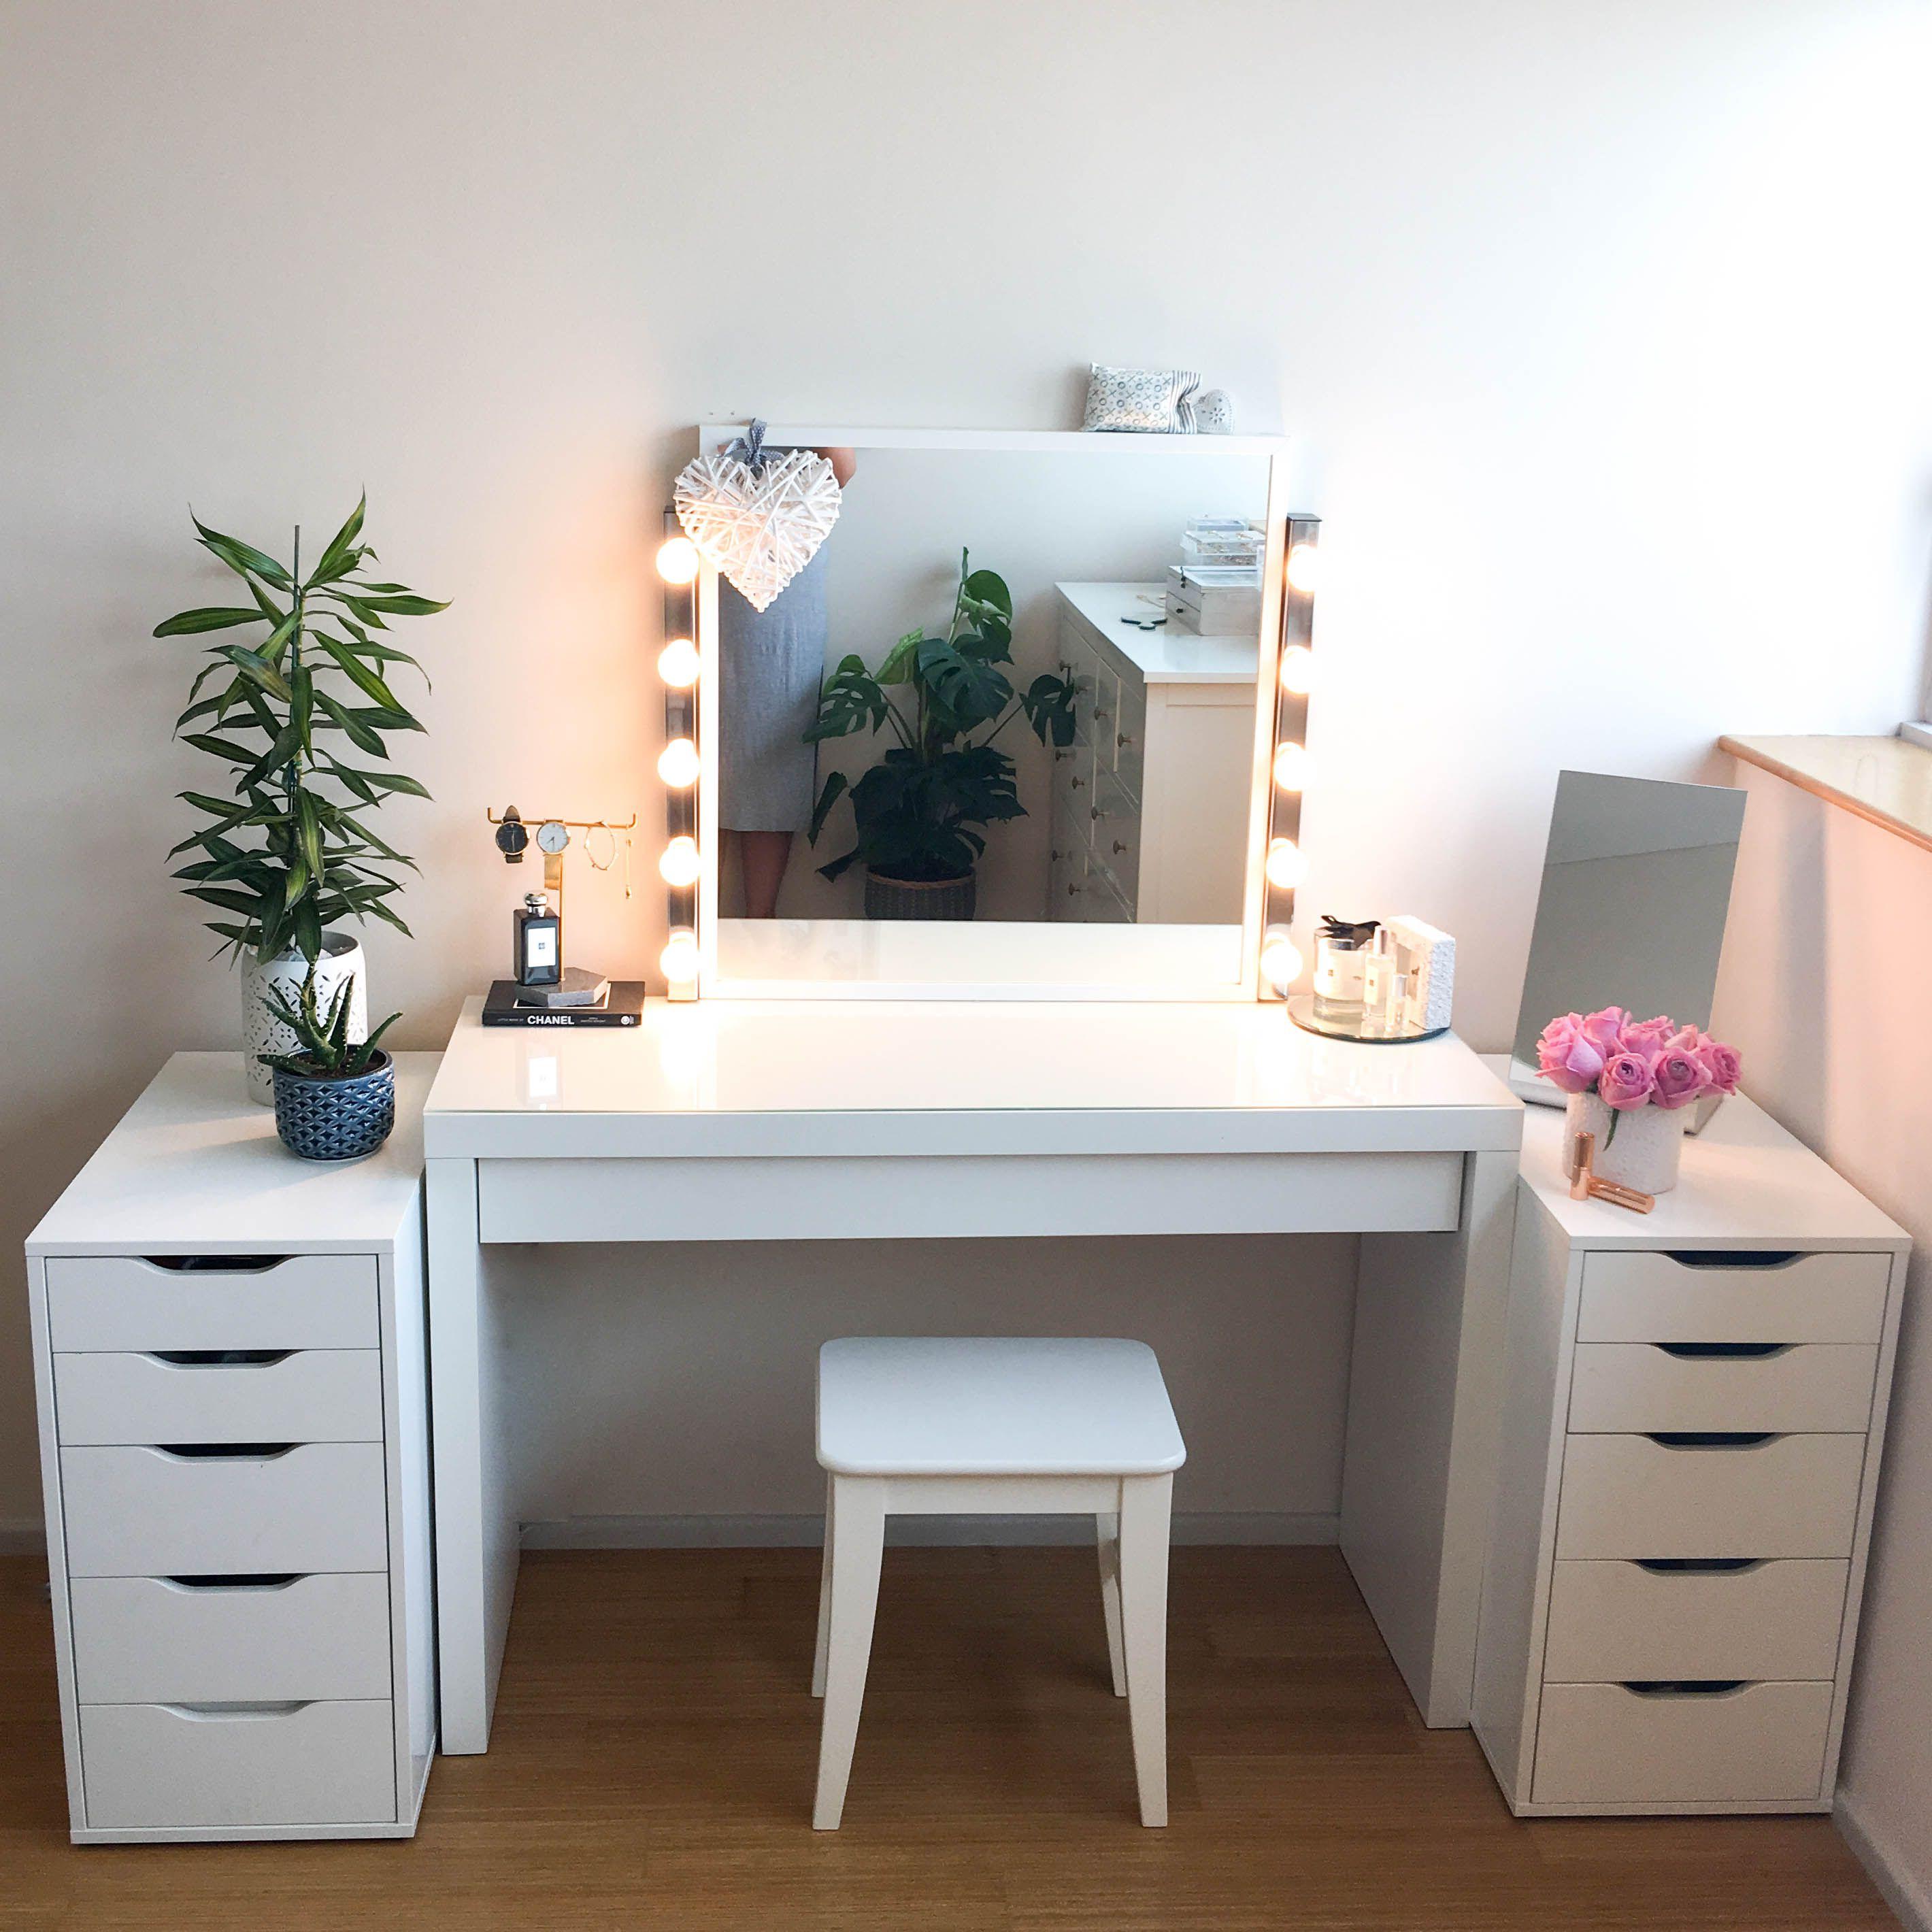 Diy Ikea Dupe Vanity Writing Desk 6 Feet Ikea Diy Diy Desk Plans Diy Makeup Desk